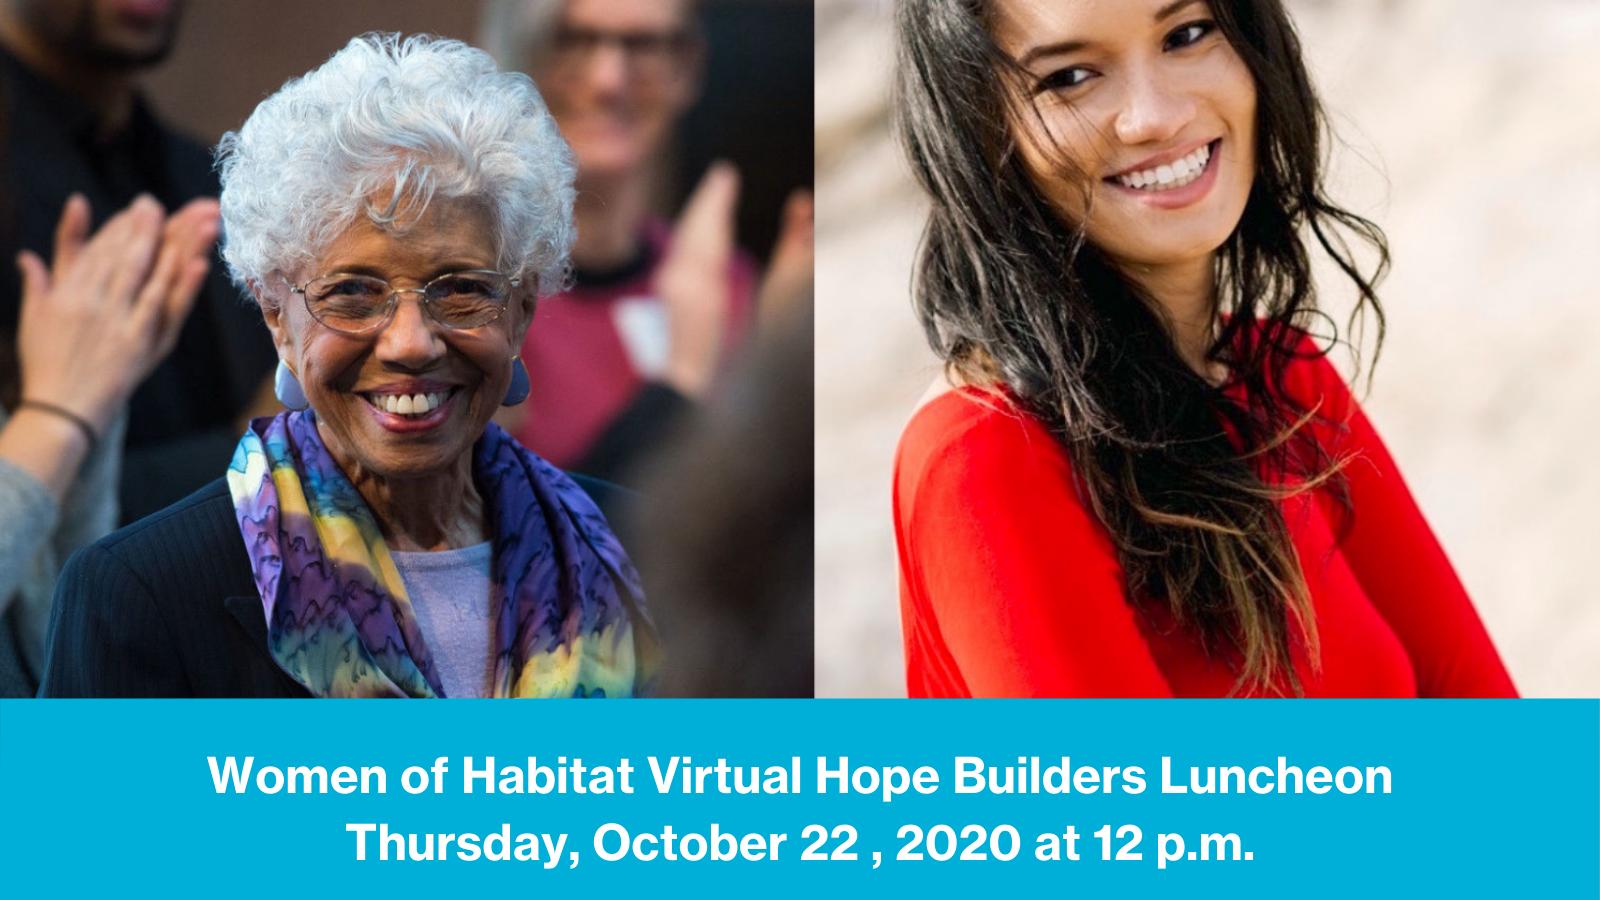 women of habitat hope builders fundraising luncheon with josie johnson and josie duffy rice